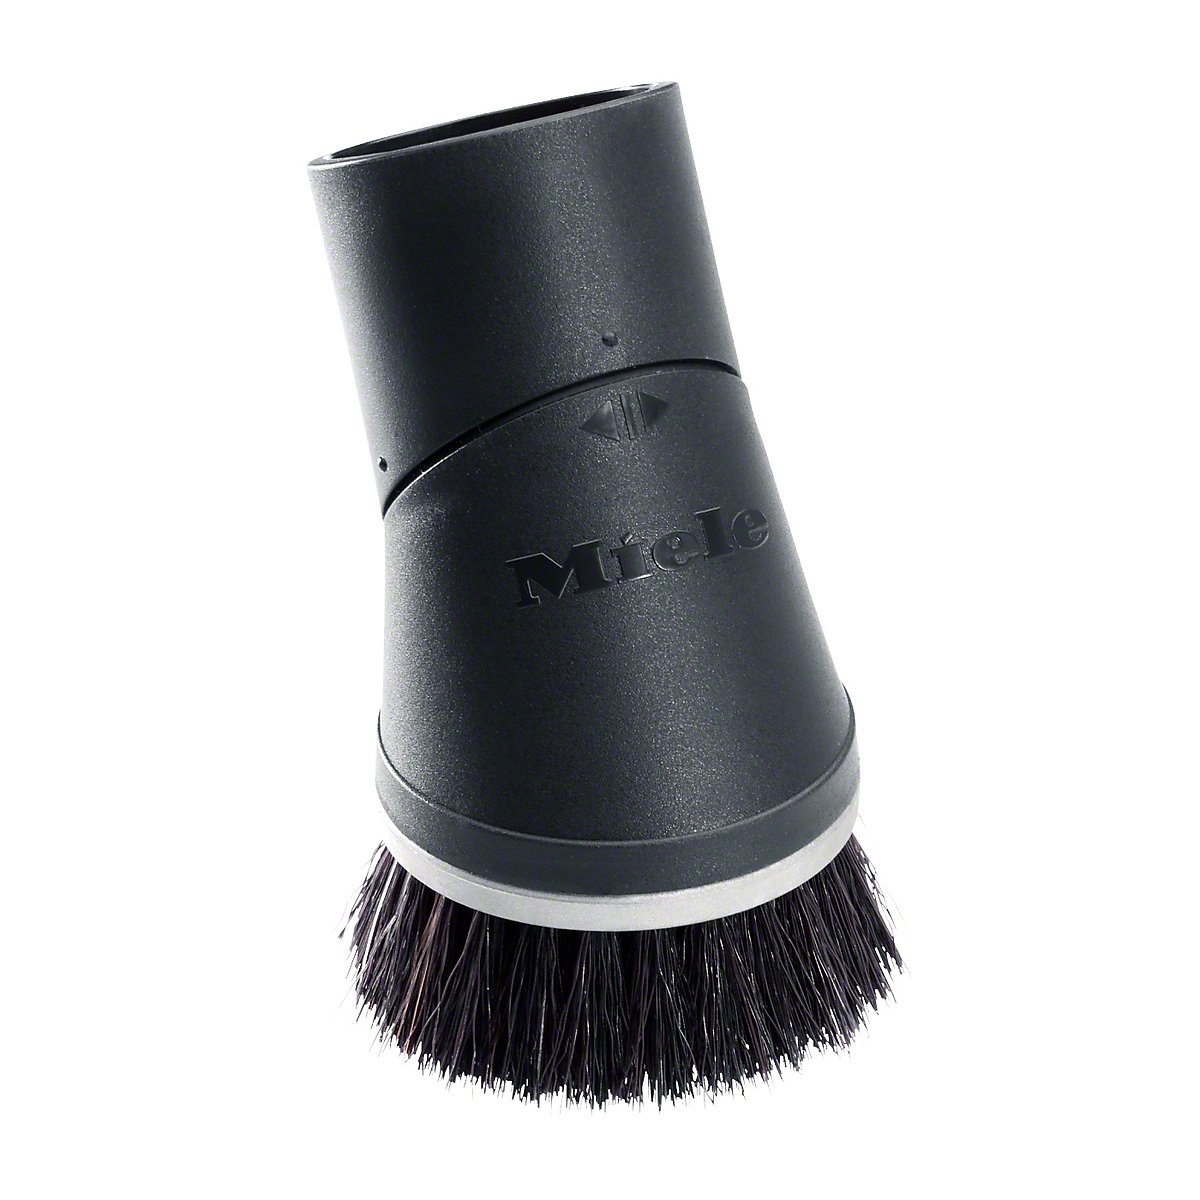 Miele Dusting Brush Natural Bristle